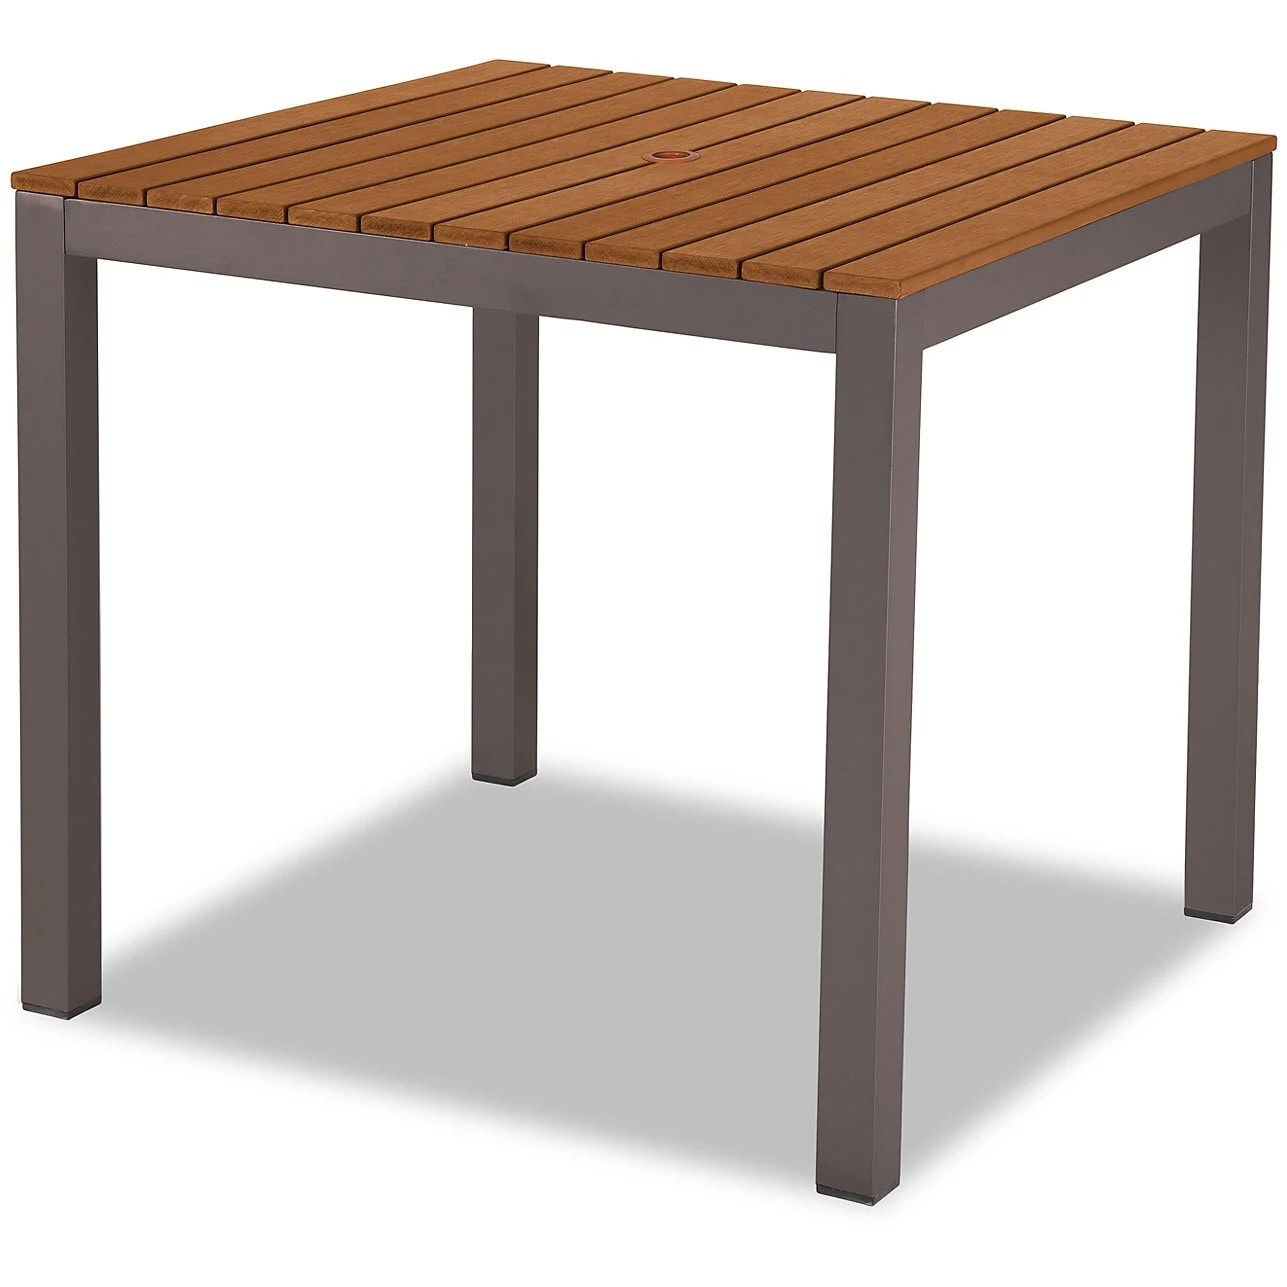 aluminum patio table in rust color finish with plastic teak slats